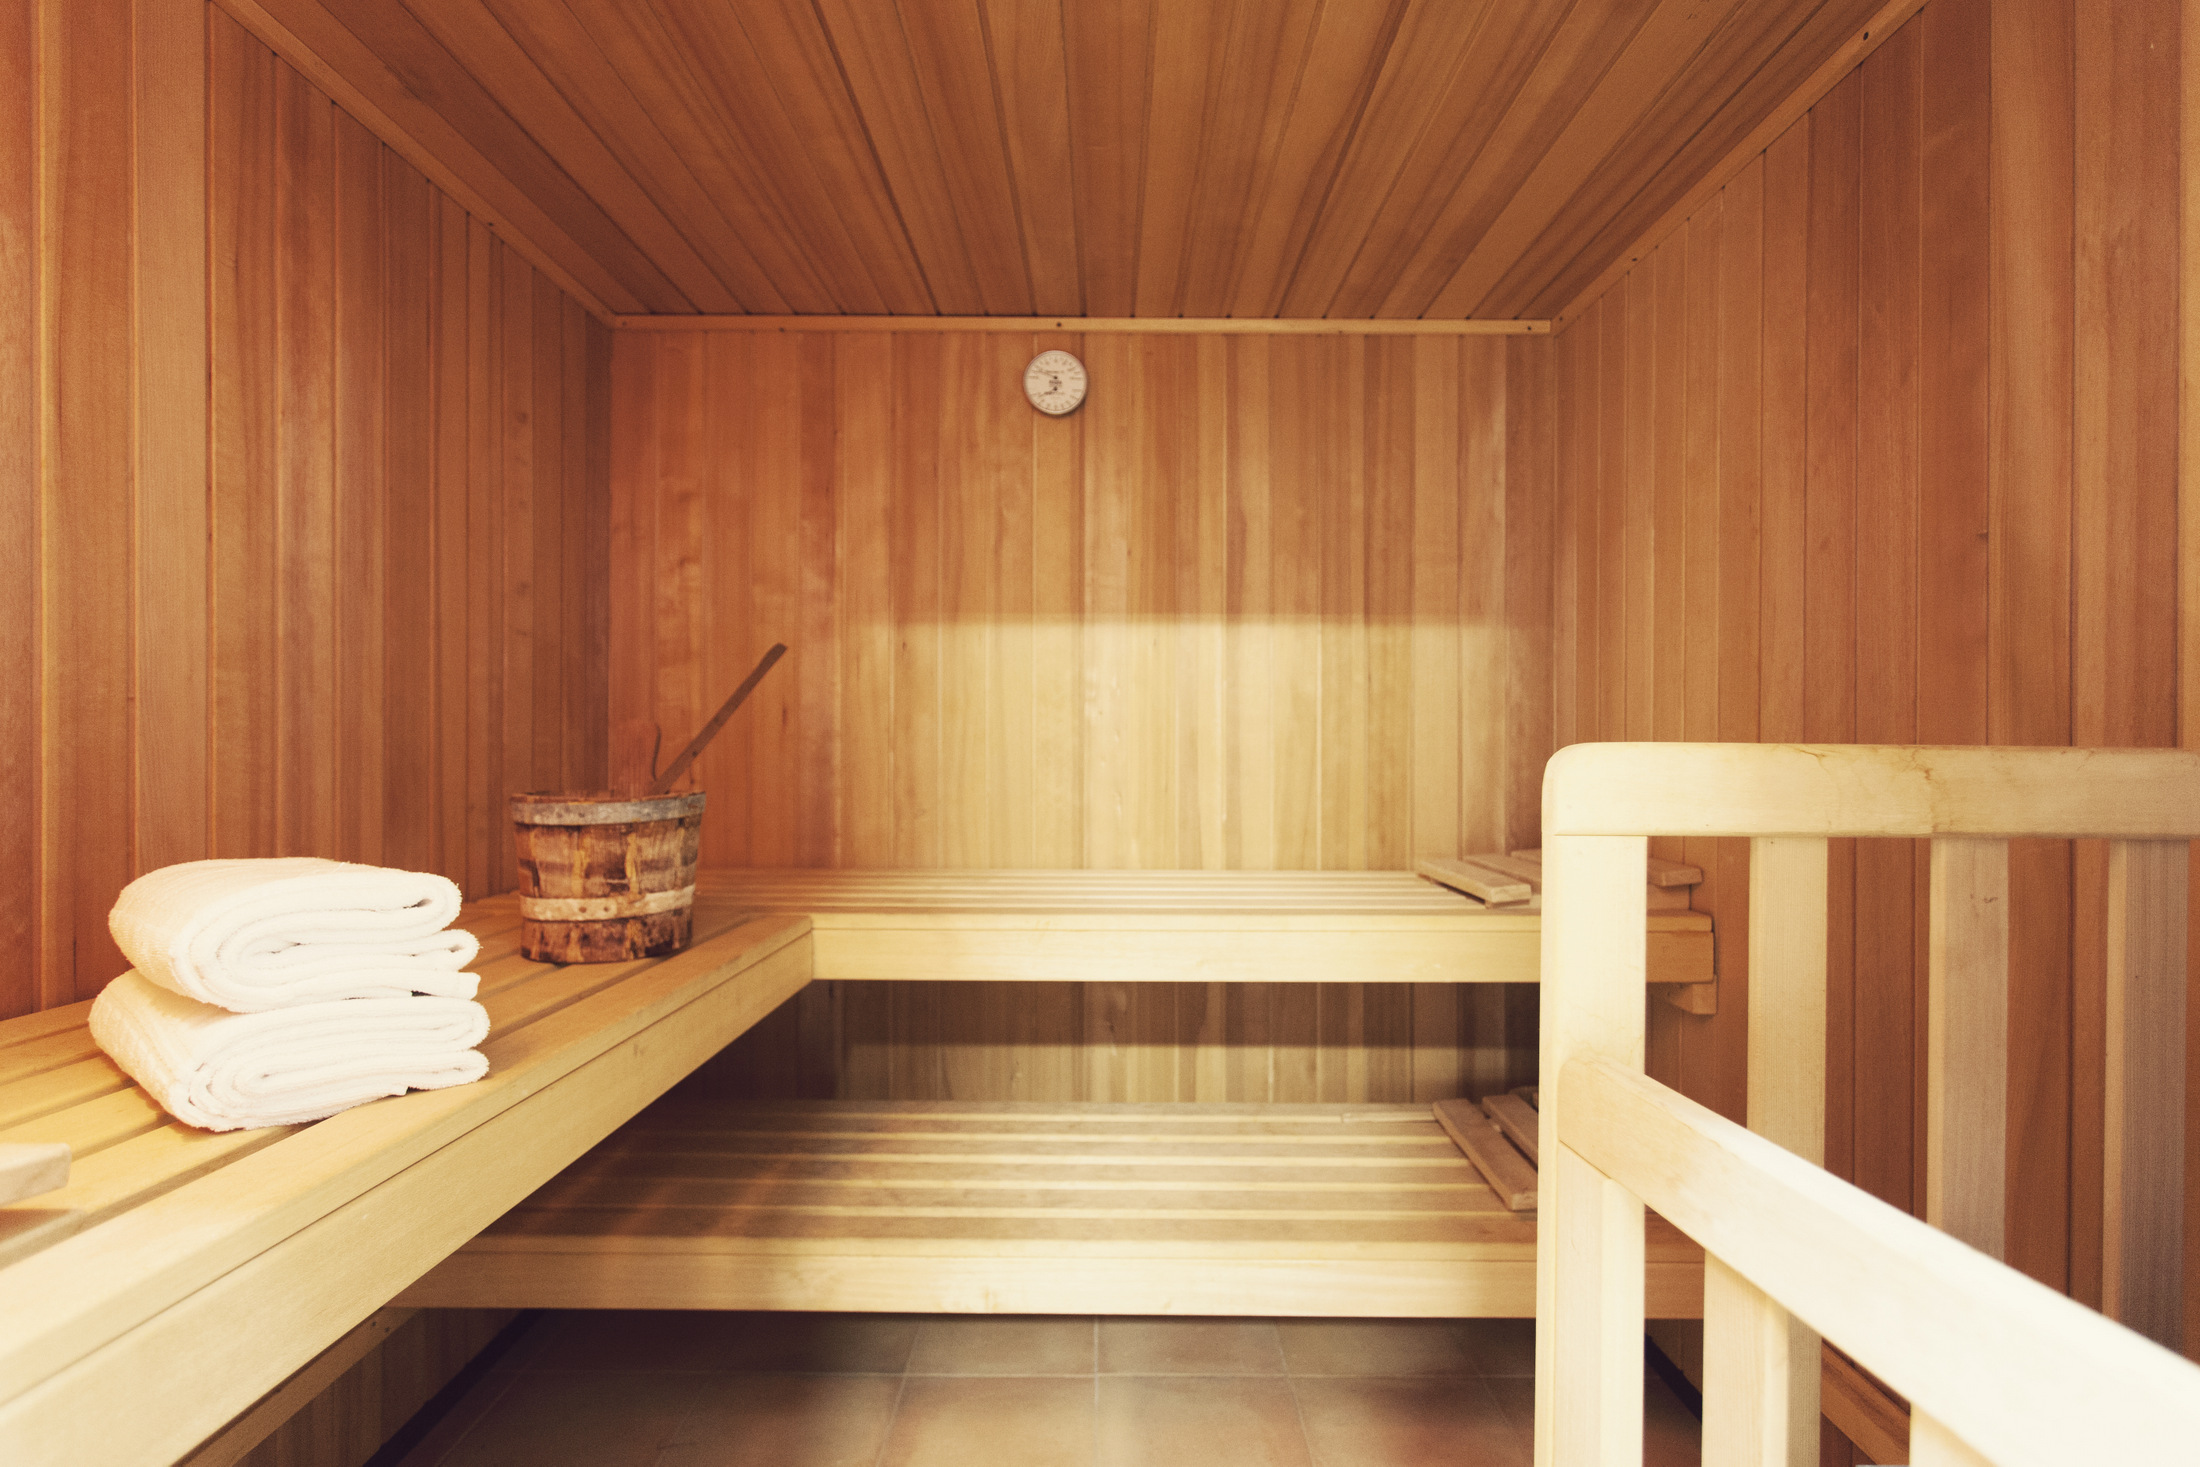 Apartment Luxury villa Luna  piscina climatizada  wi-fi  gym  sauna photo 20126672